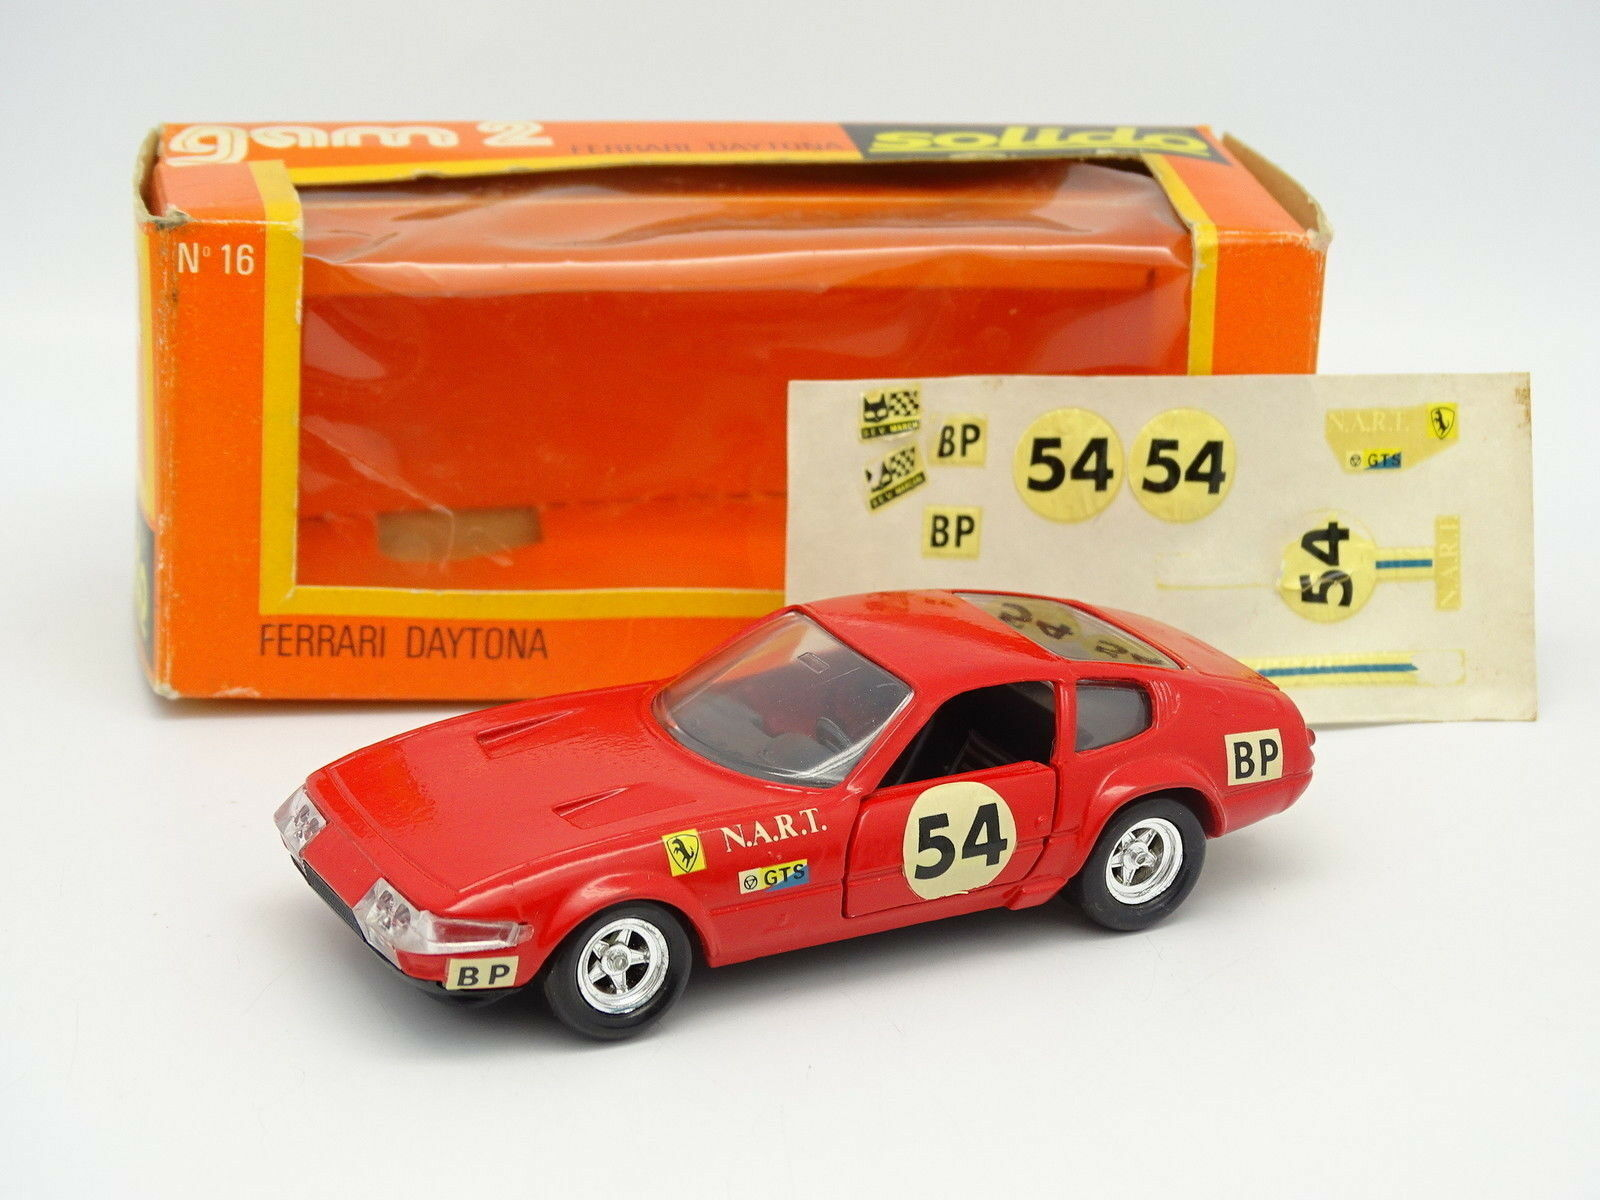 Solido 1 1 1 43 - Ferrari 365 GTB 4 Daytona Le Mans 1974 No.54 591740